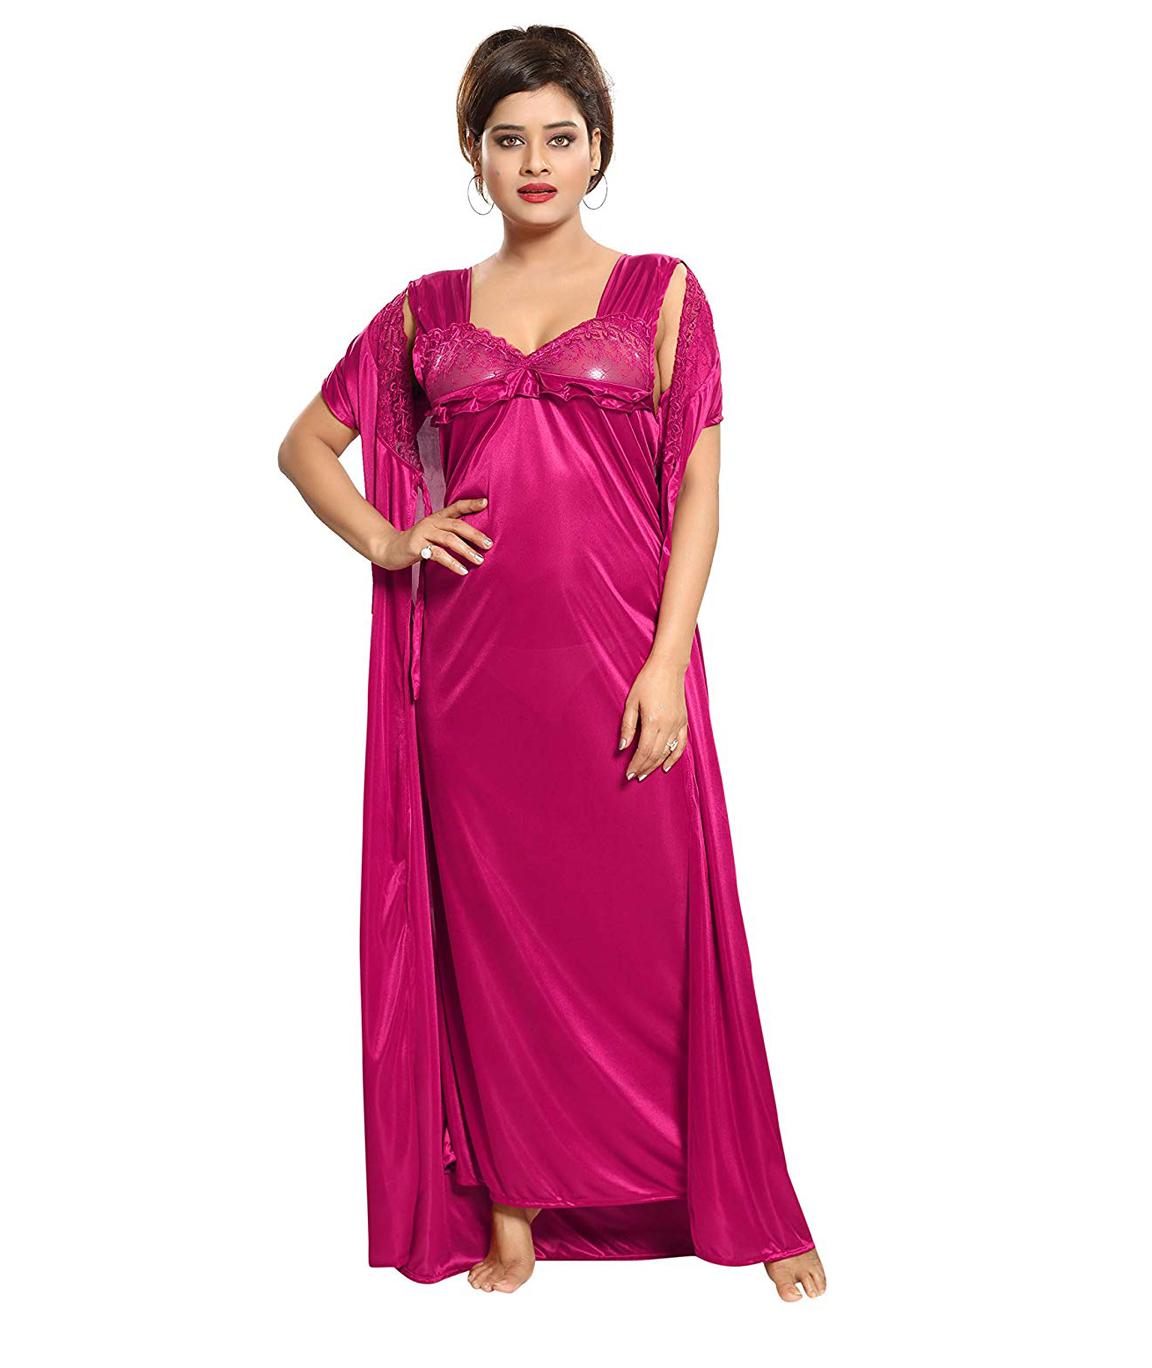 Romaisa Women`s Satin Nightwear Set of 4 Pcs Nighty, Wrap Gown, Top, Capri (Size - Small, Medium, Large) (Pack of 4) COLOUR : MAGENTA